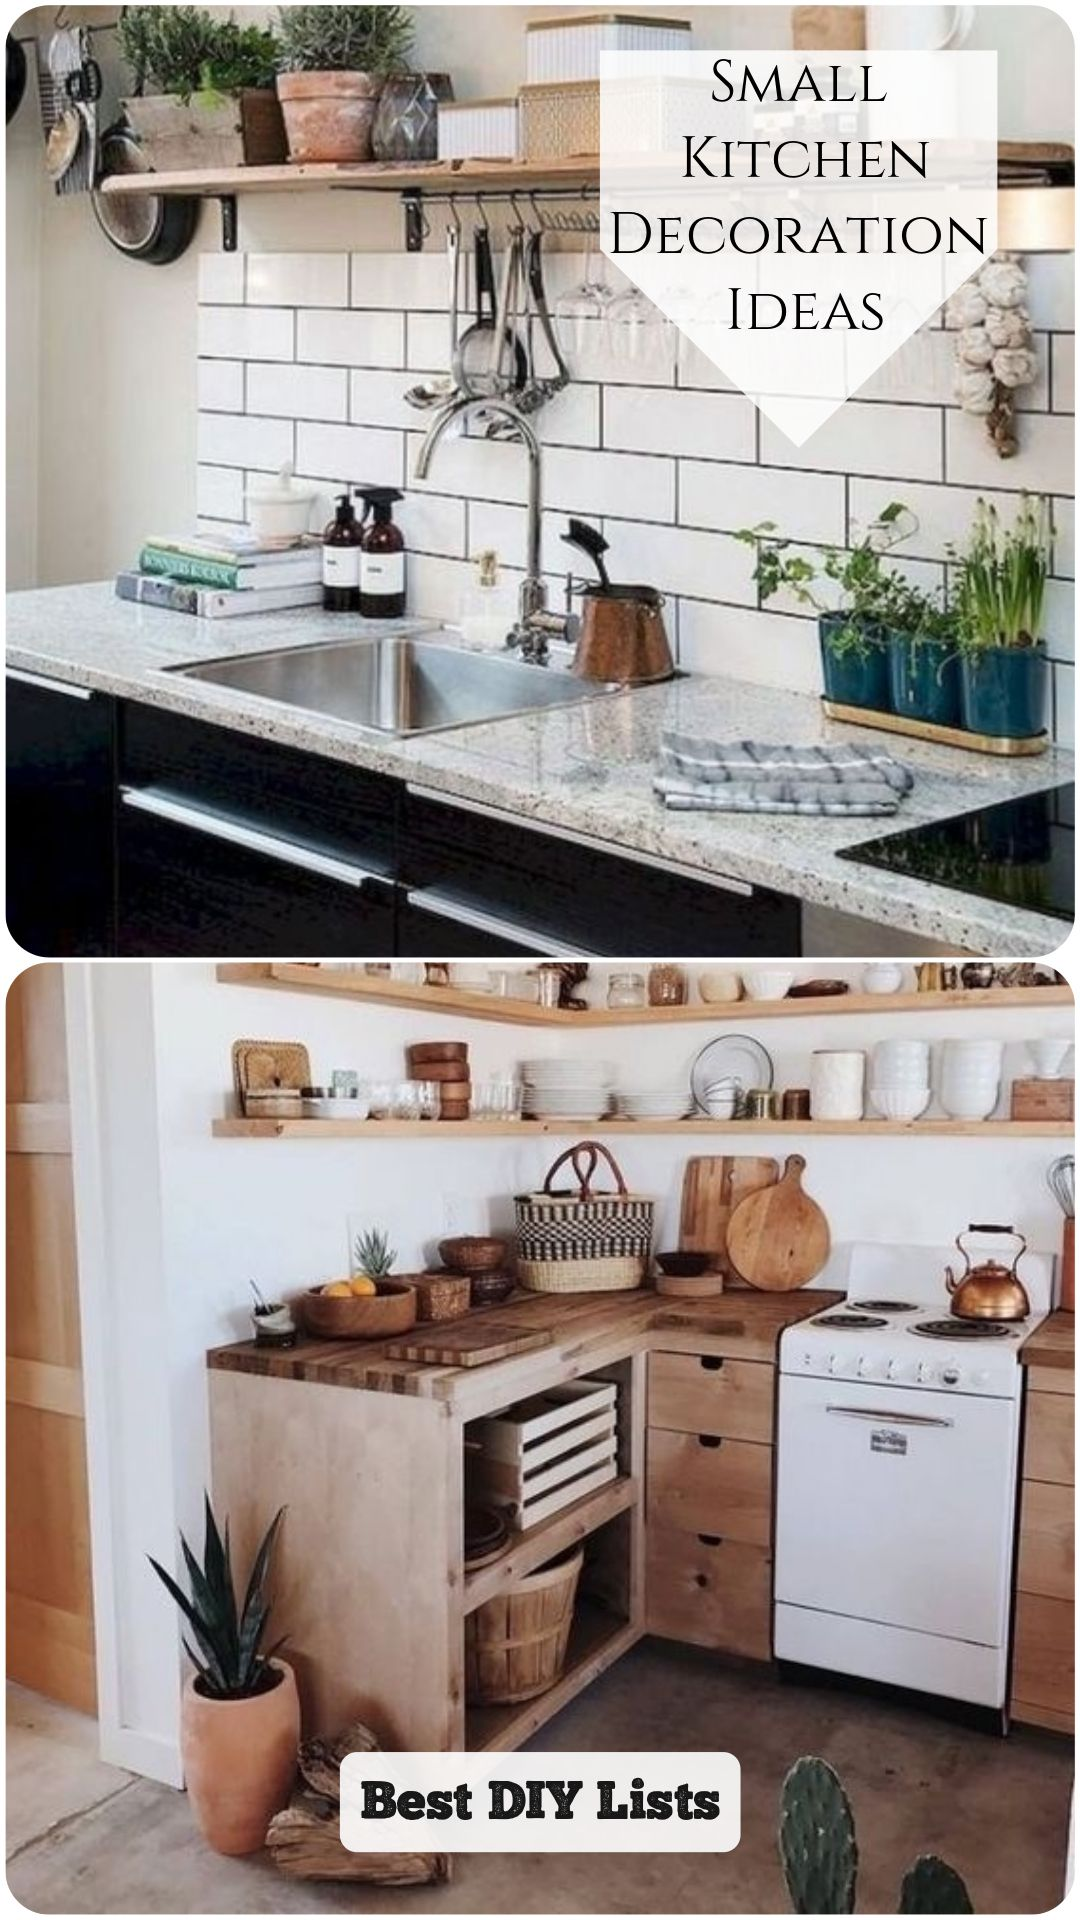 Small Kitchen Decoration Ideas in 9  Cheap kitchen decor